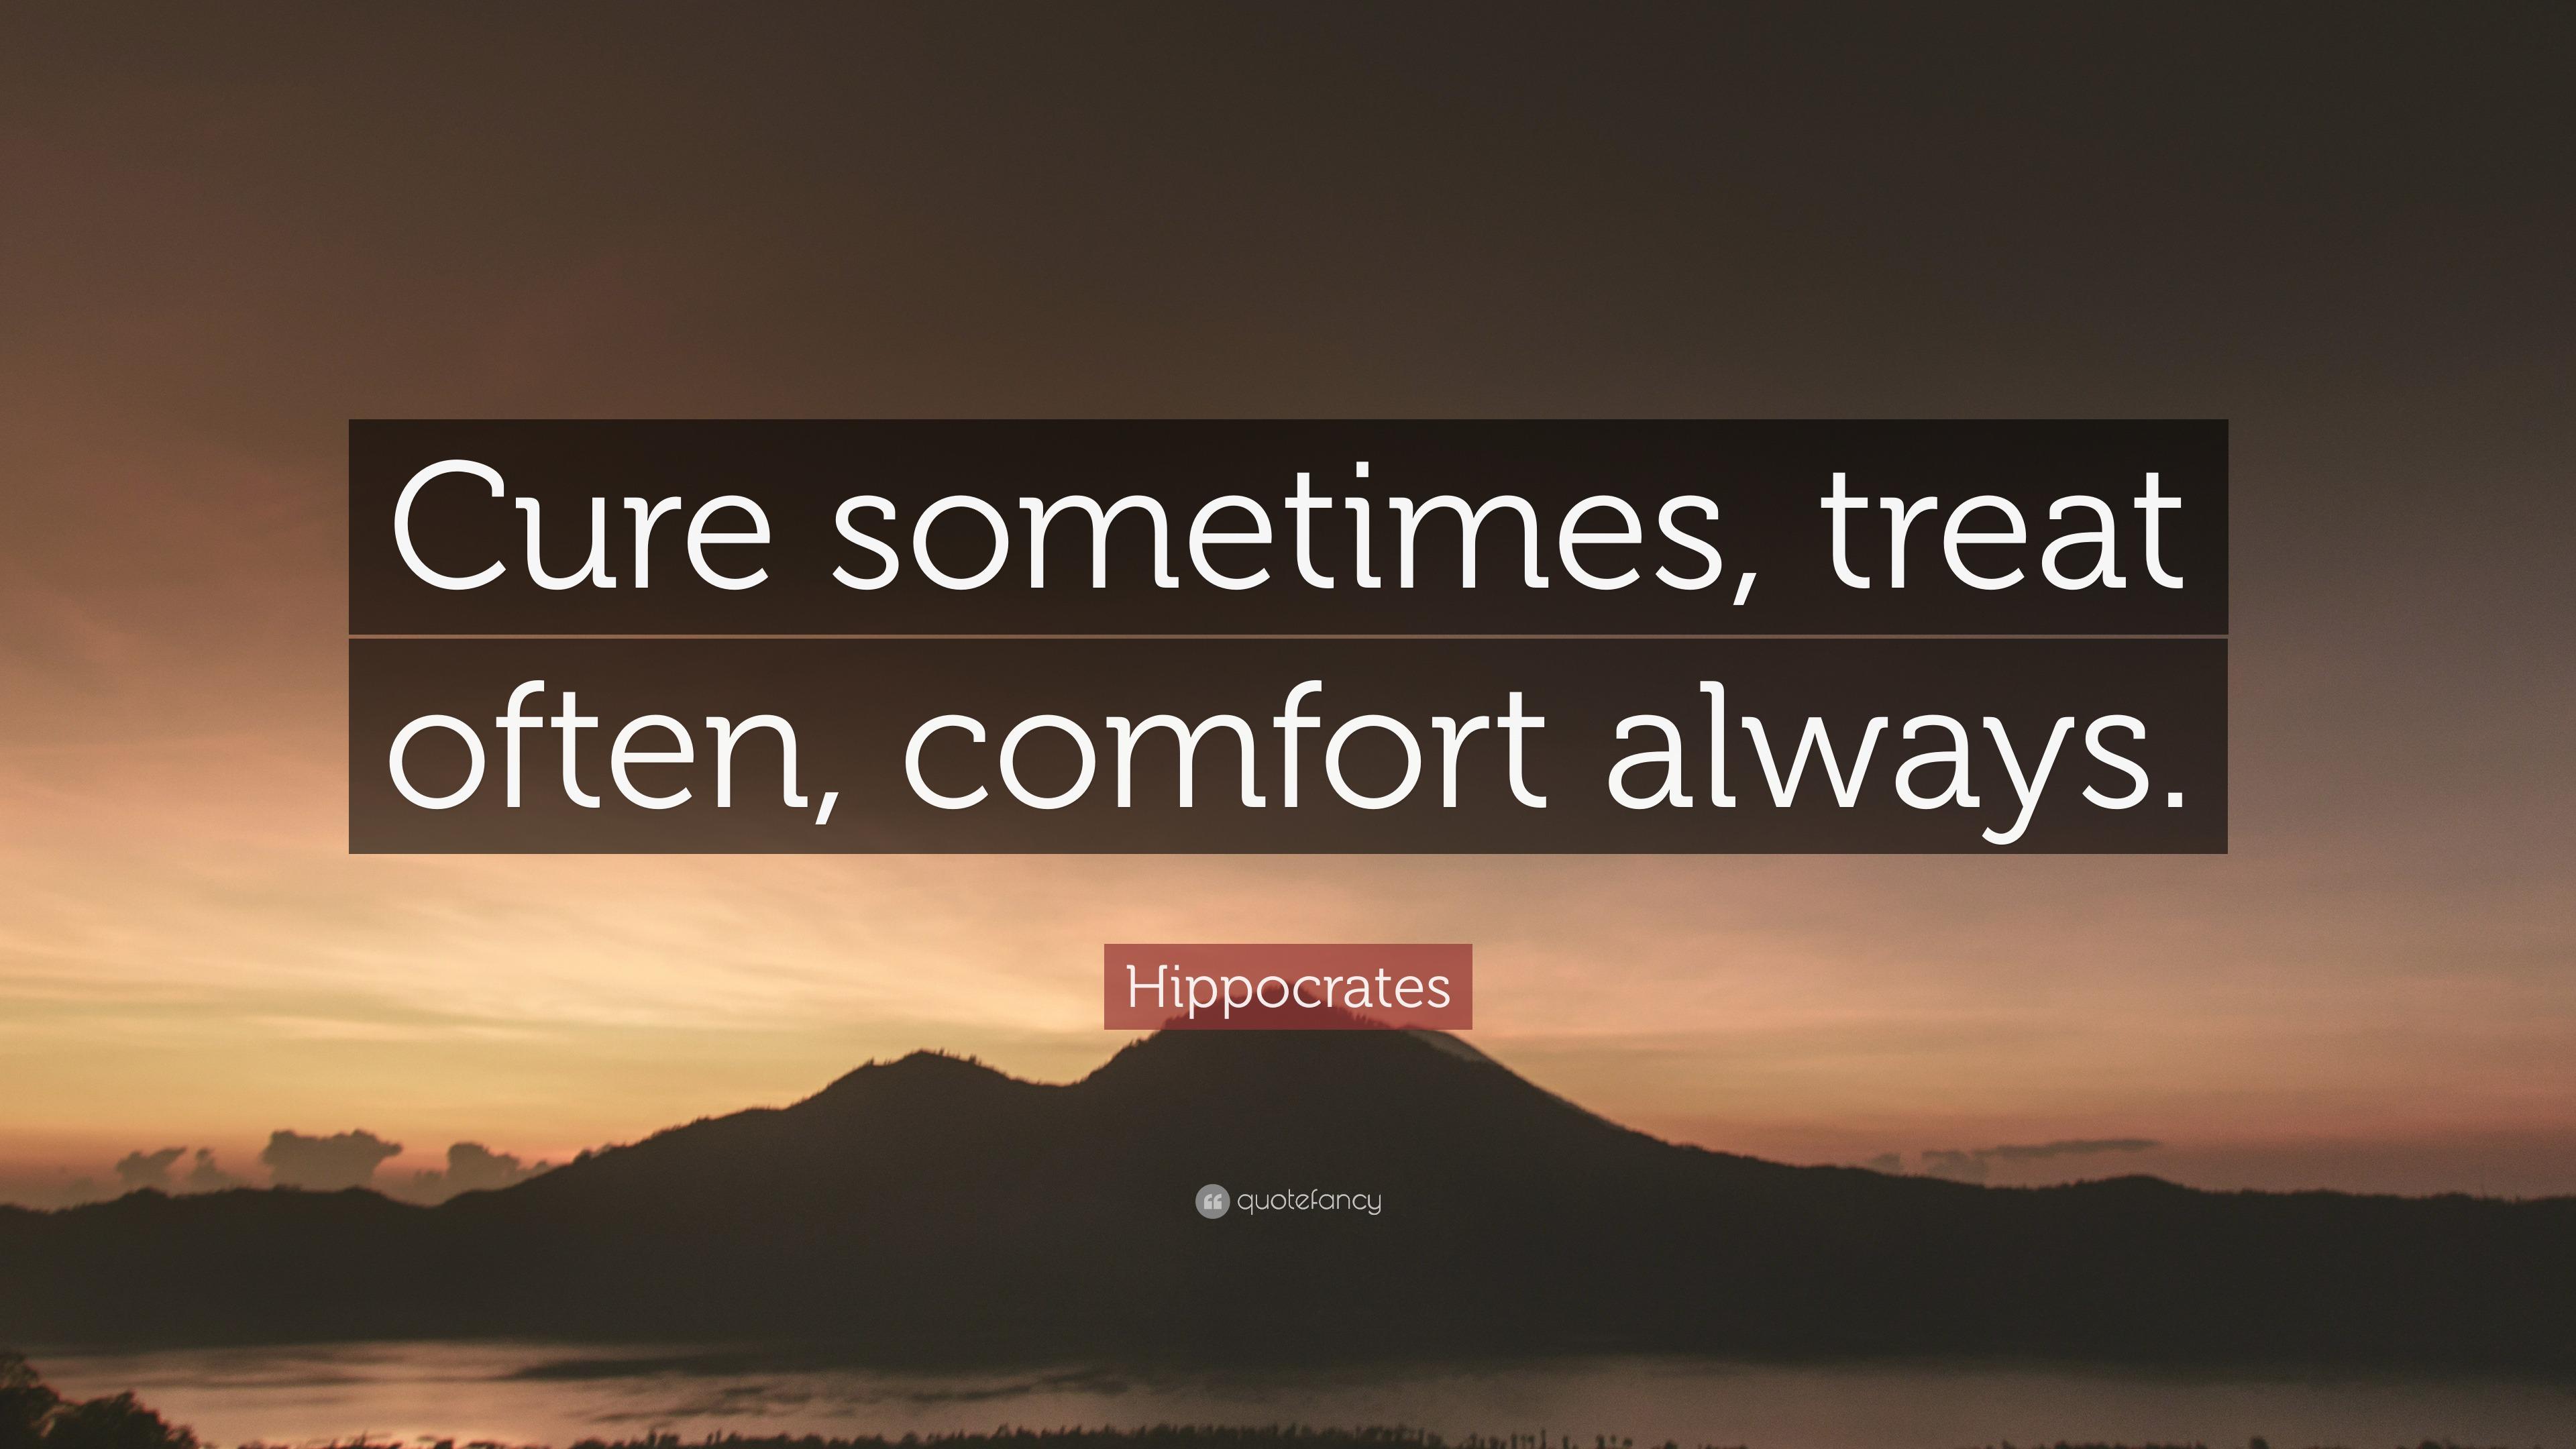 Medicine Quotes Wallpaper Hippocrates Quote Cure Sometimes Treat Often Comfort